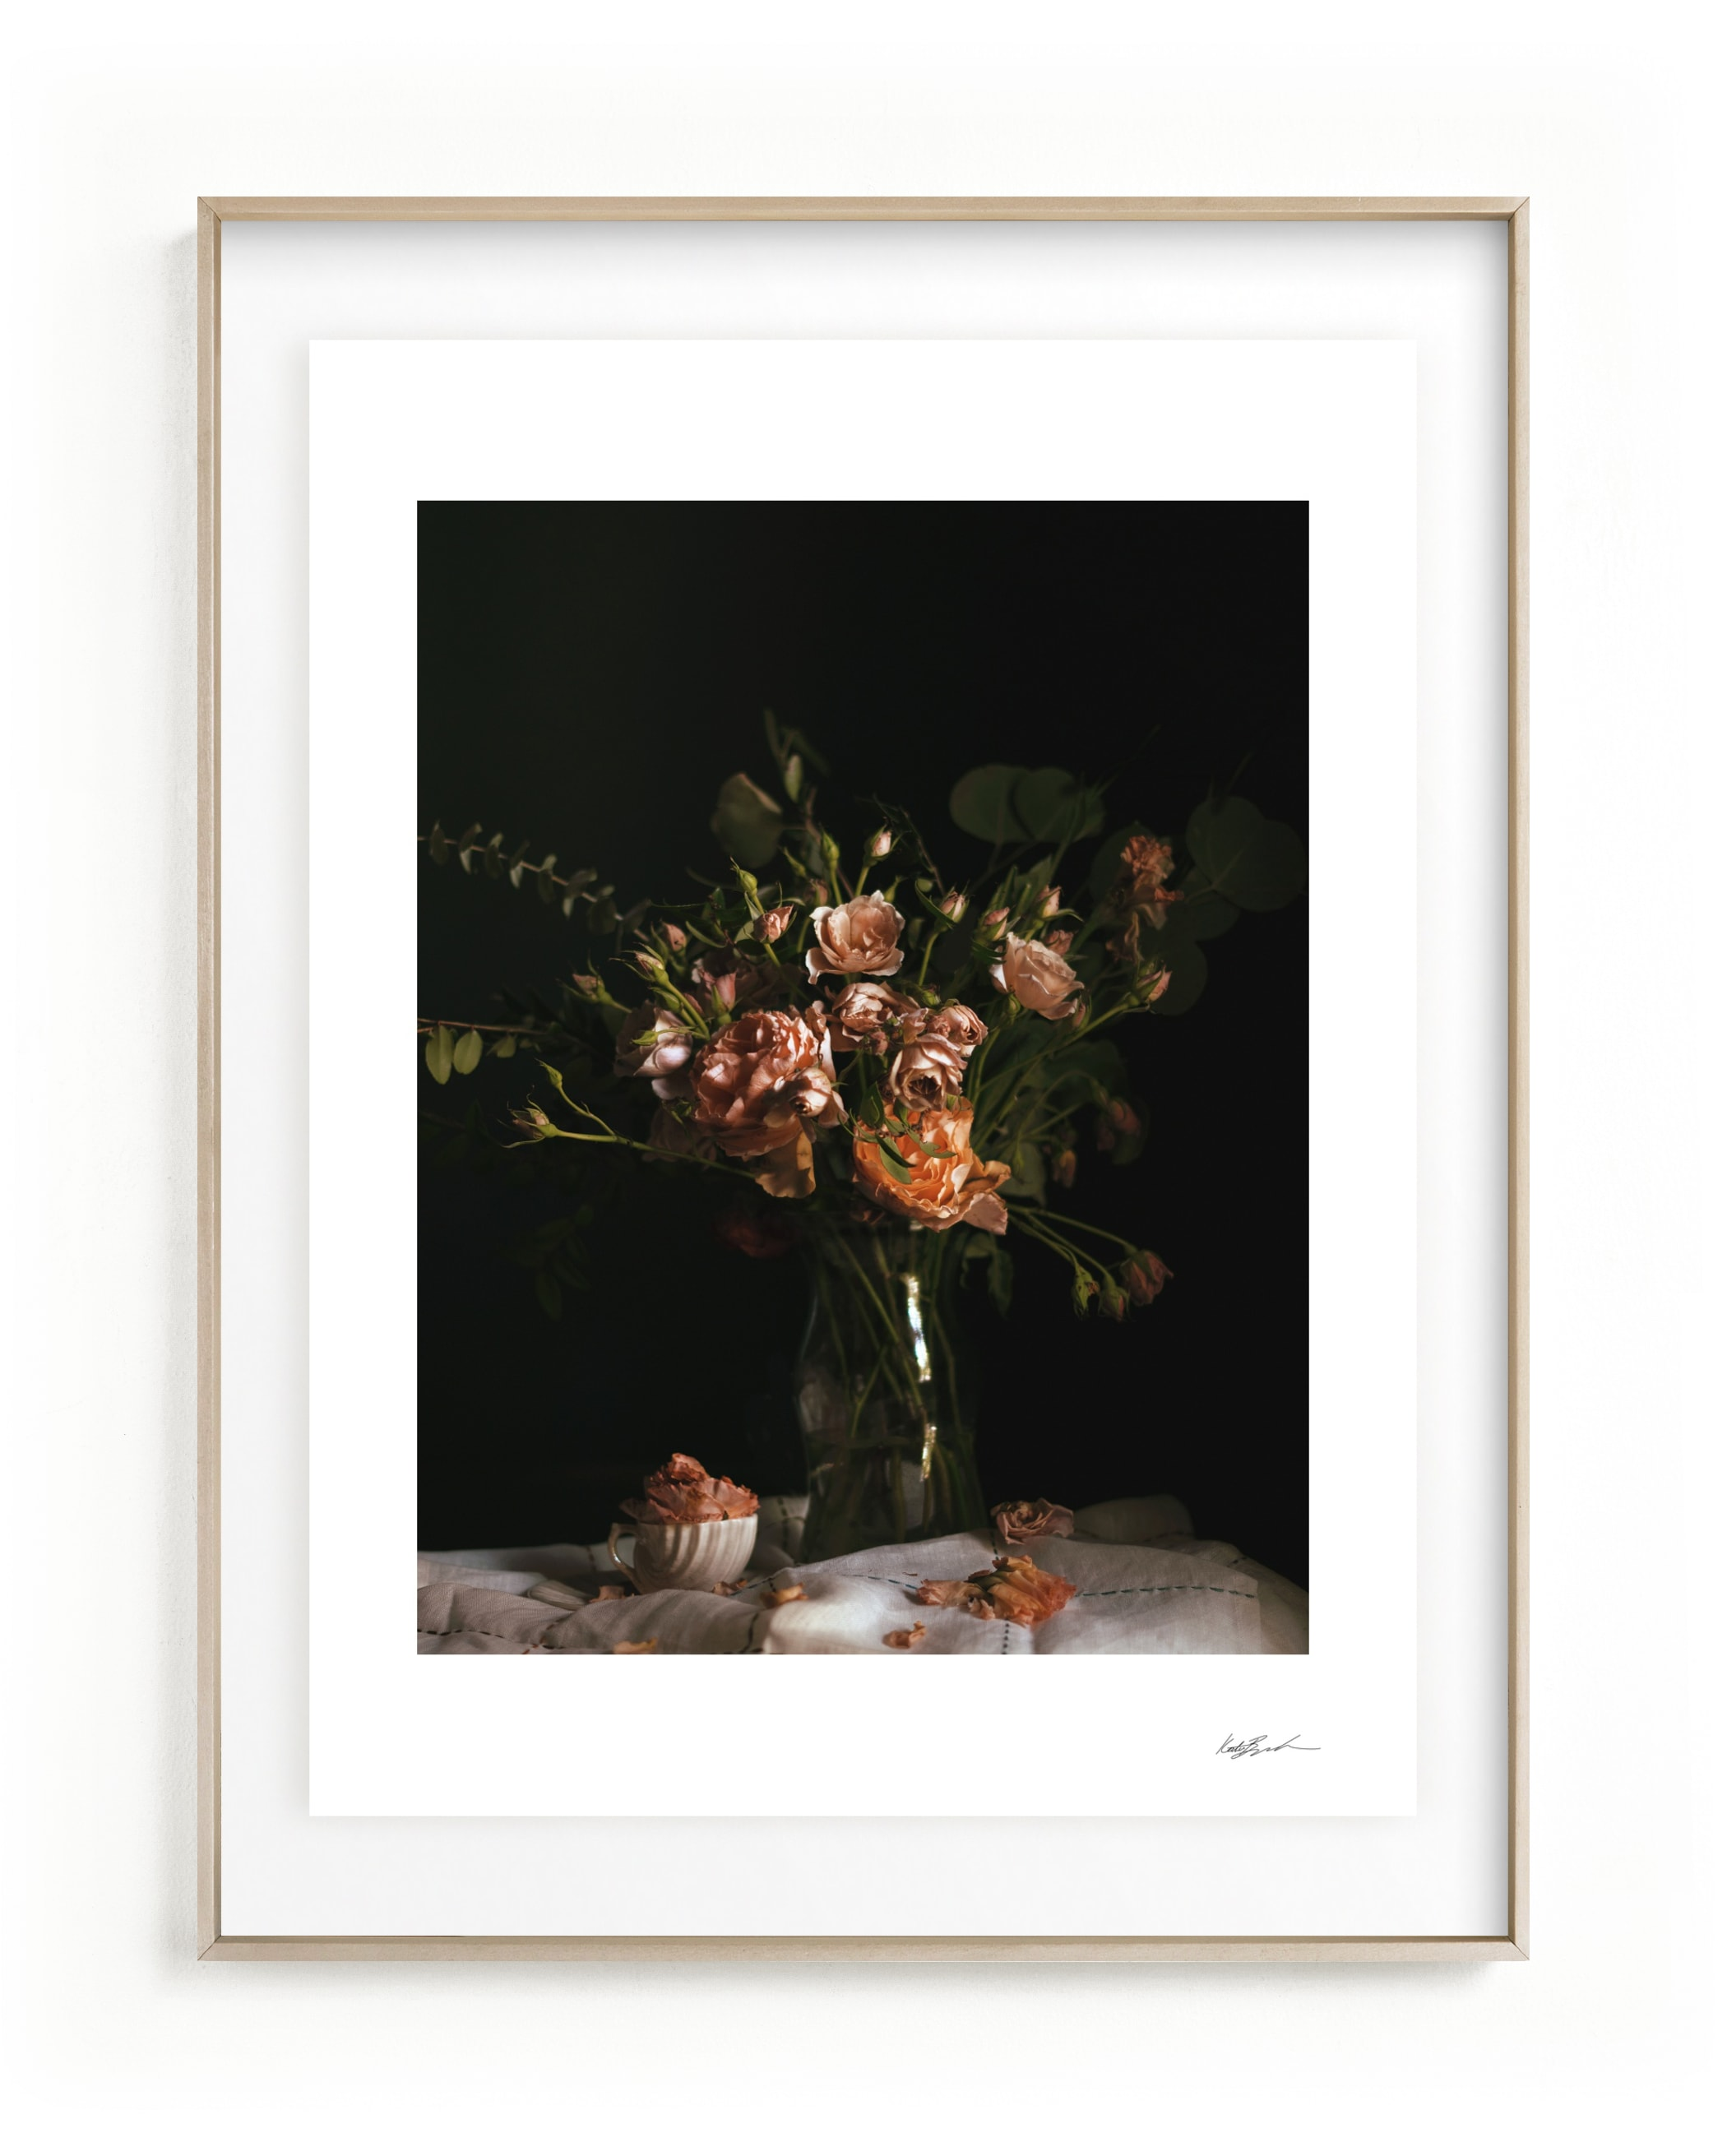 Moody Floral Still Life Wall Art Print